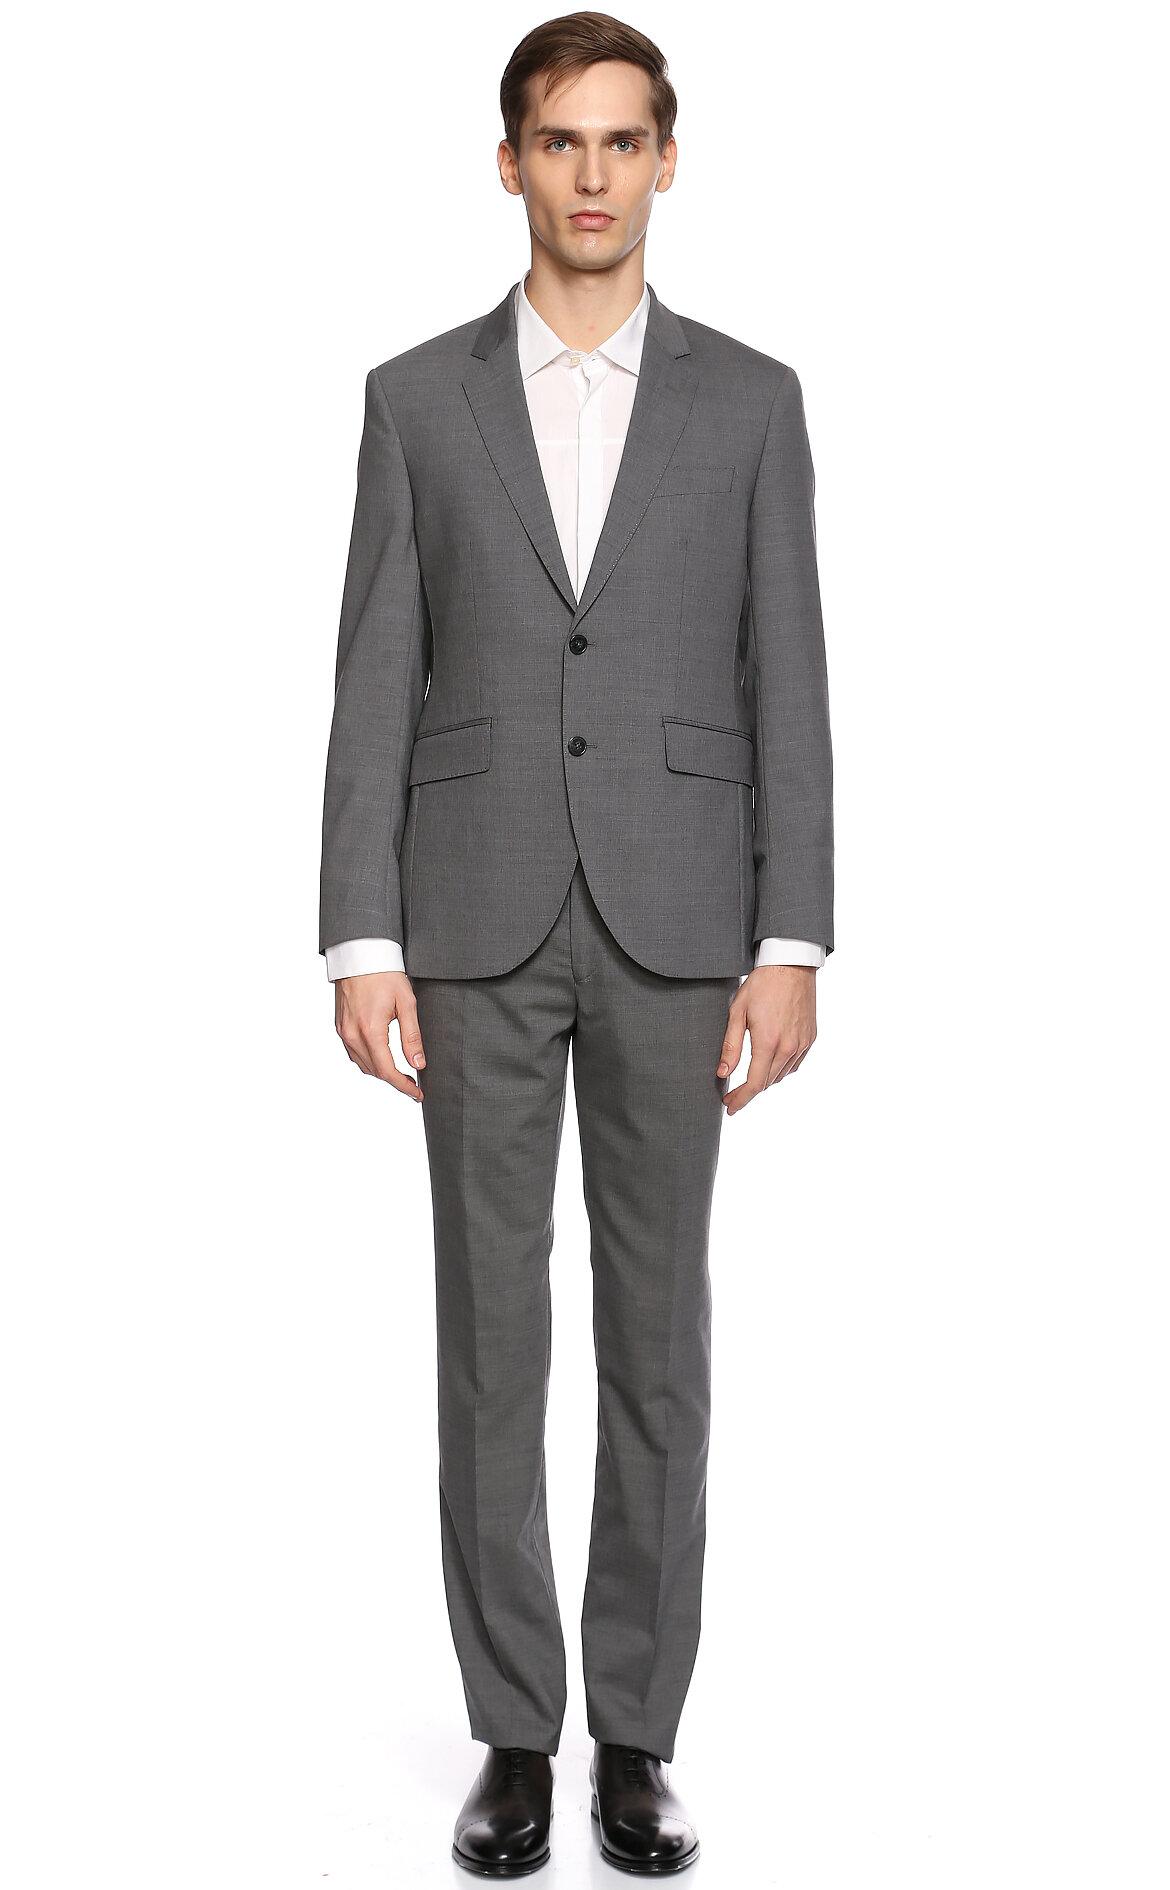 Hackett-Hackett Takım Elbise